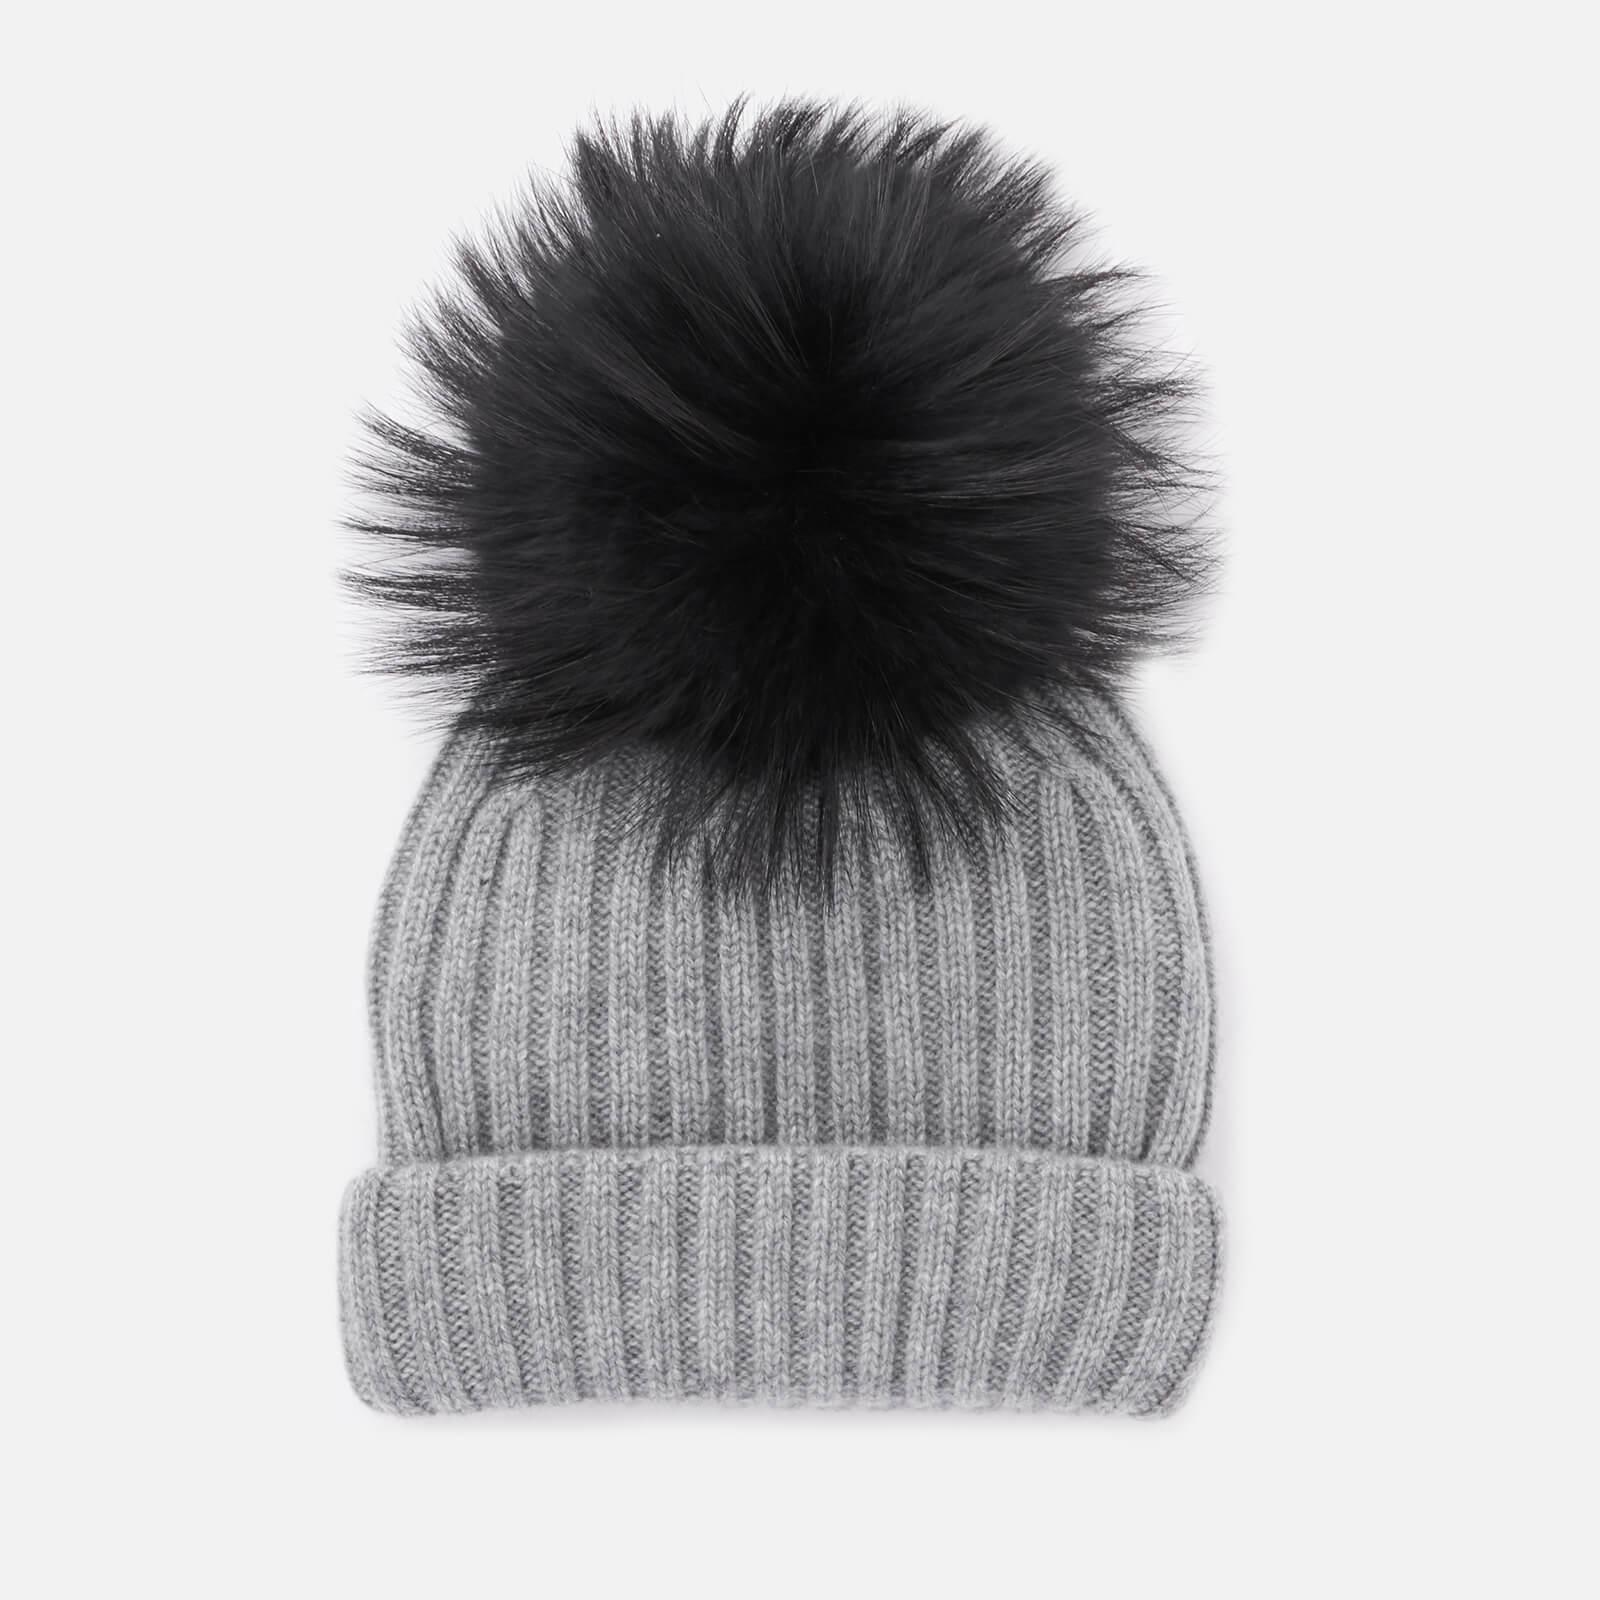 11c7960dcc4 BKLYN Women s Cashmere Pom Pom Hat - Grey Black - Free UK Delivery over £50